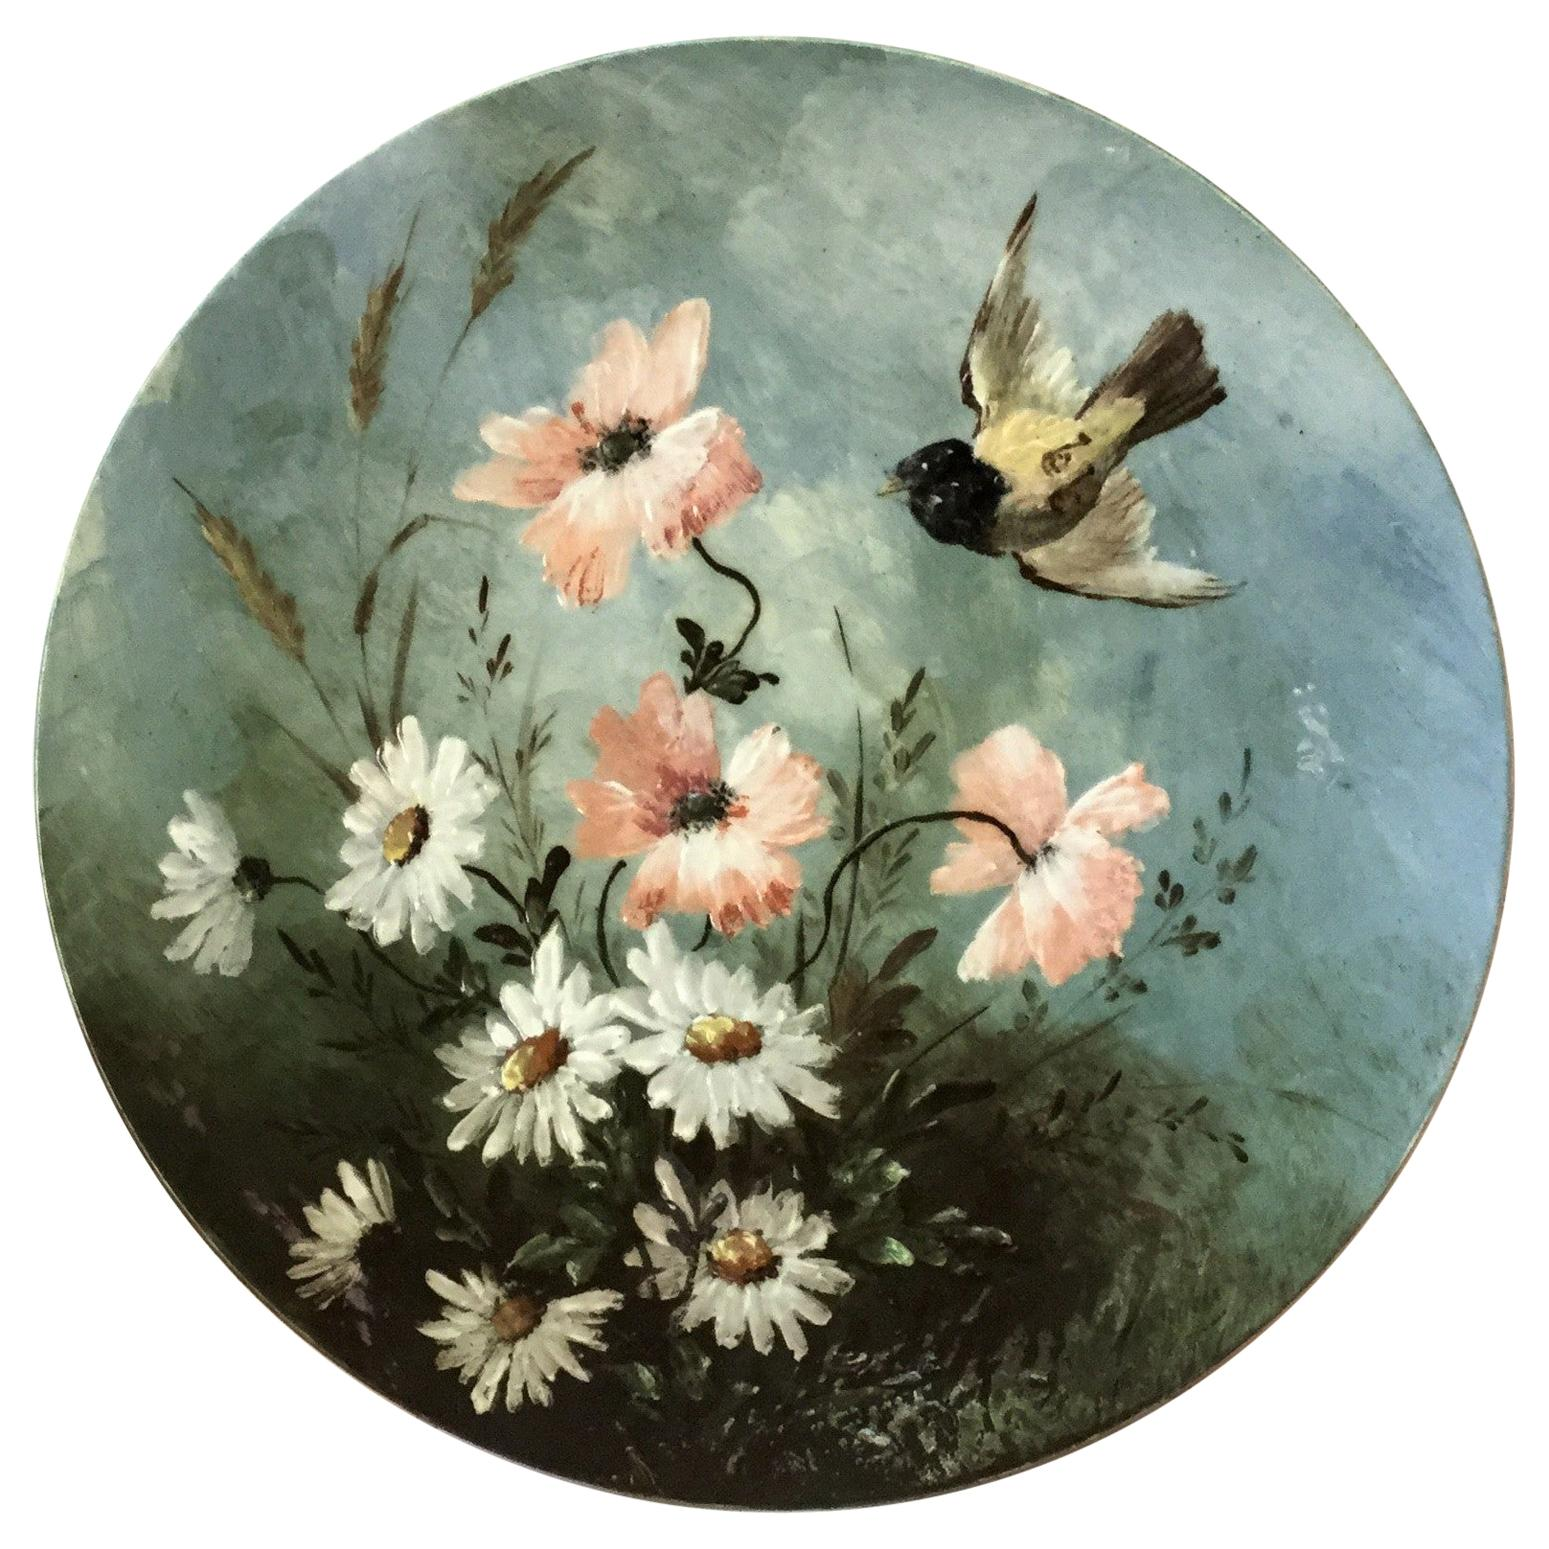 19th Century French Majolica Platter Bird and Flowers Longwy